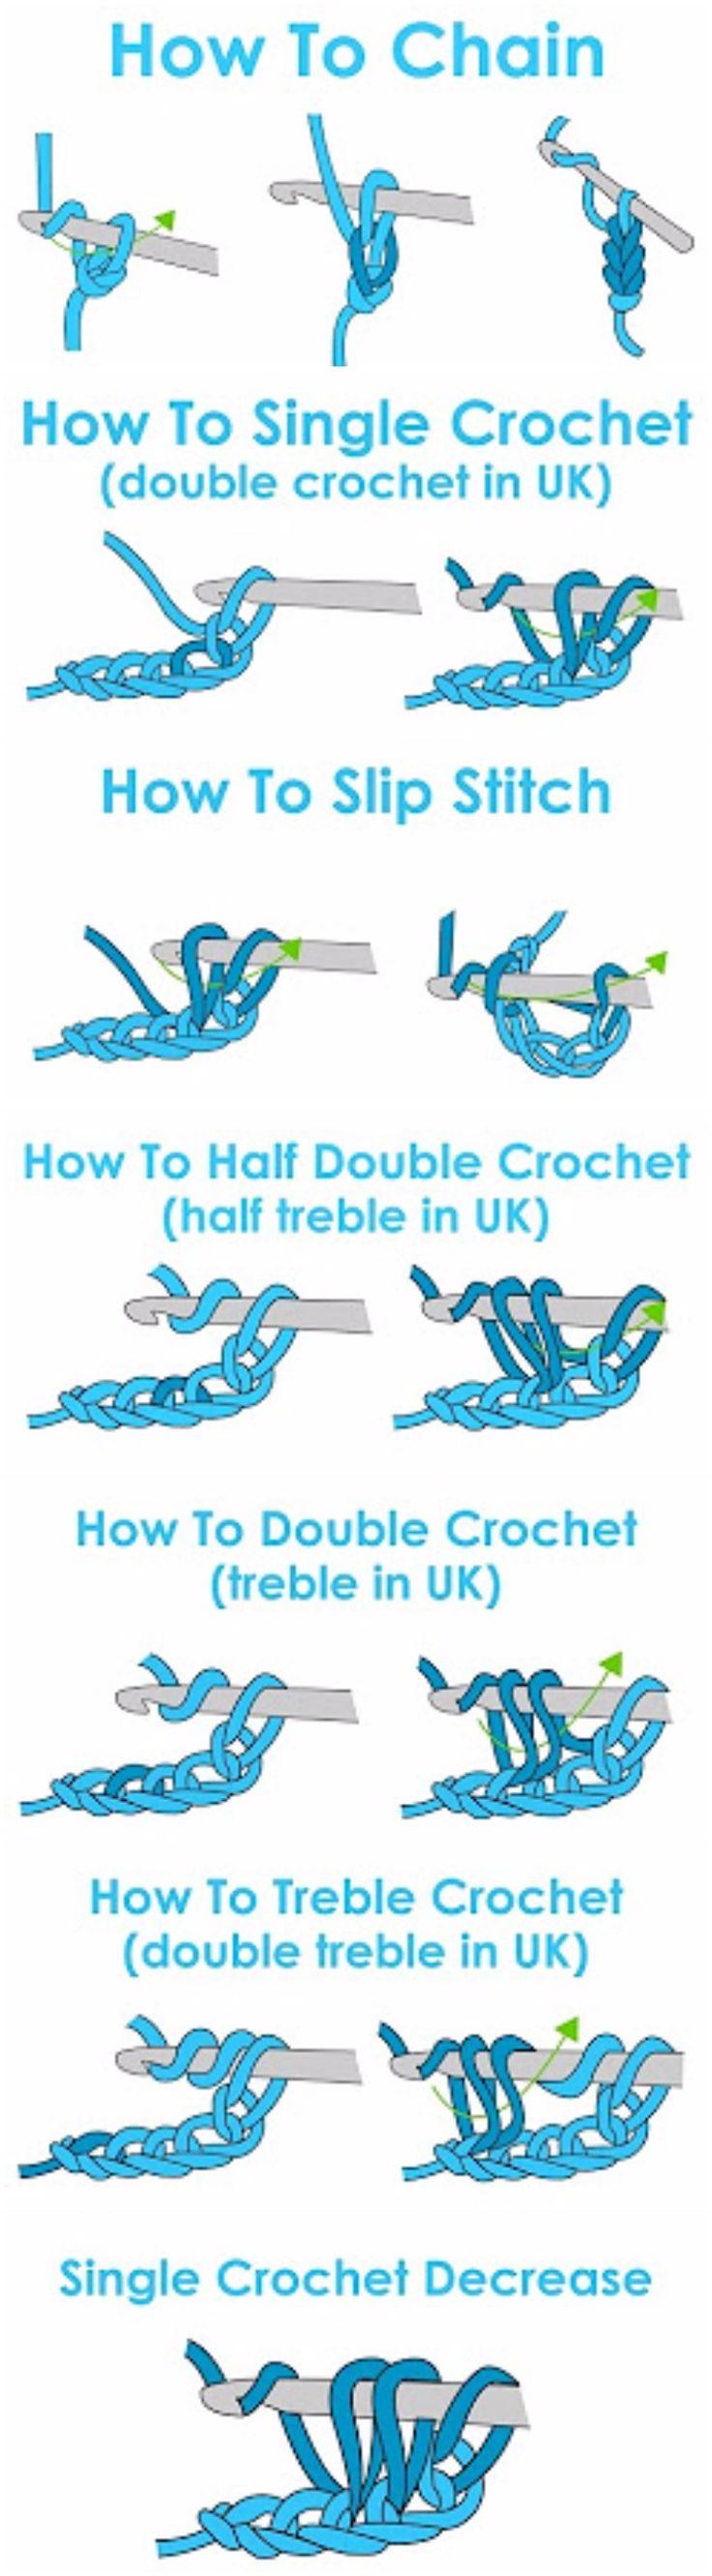 Crochet Single, Half Double, Slip Stitch Crochet and etc..